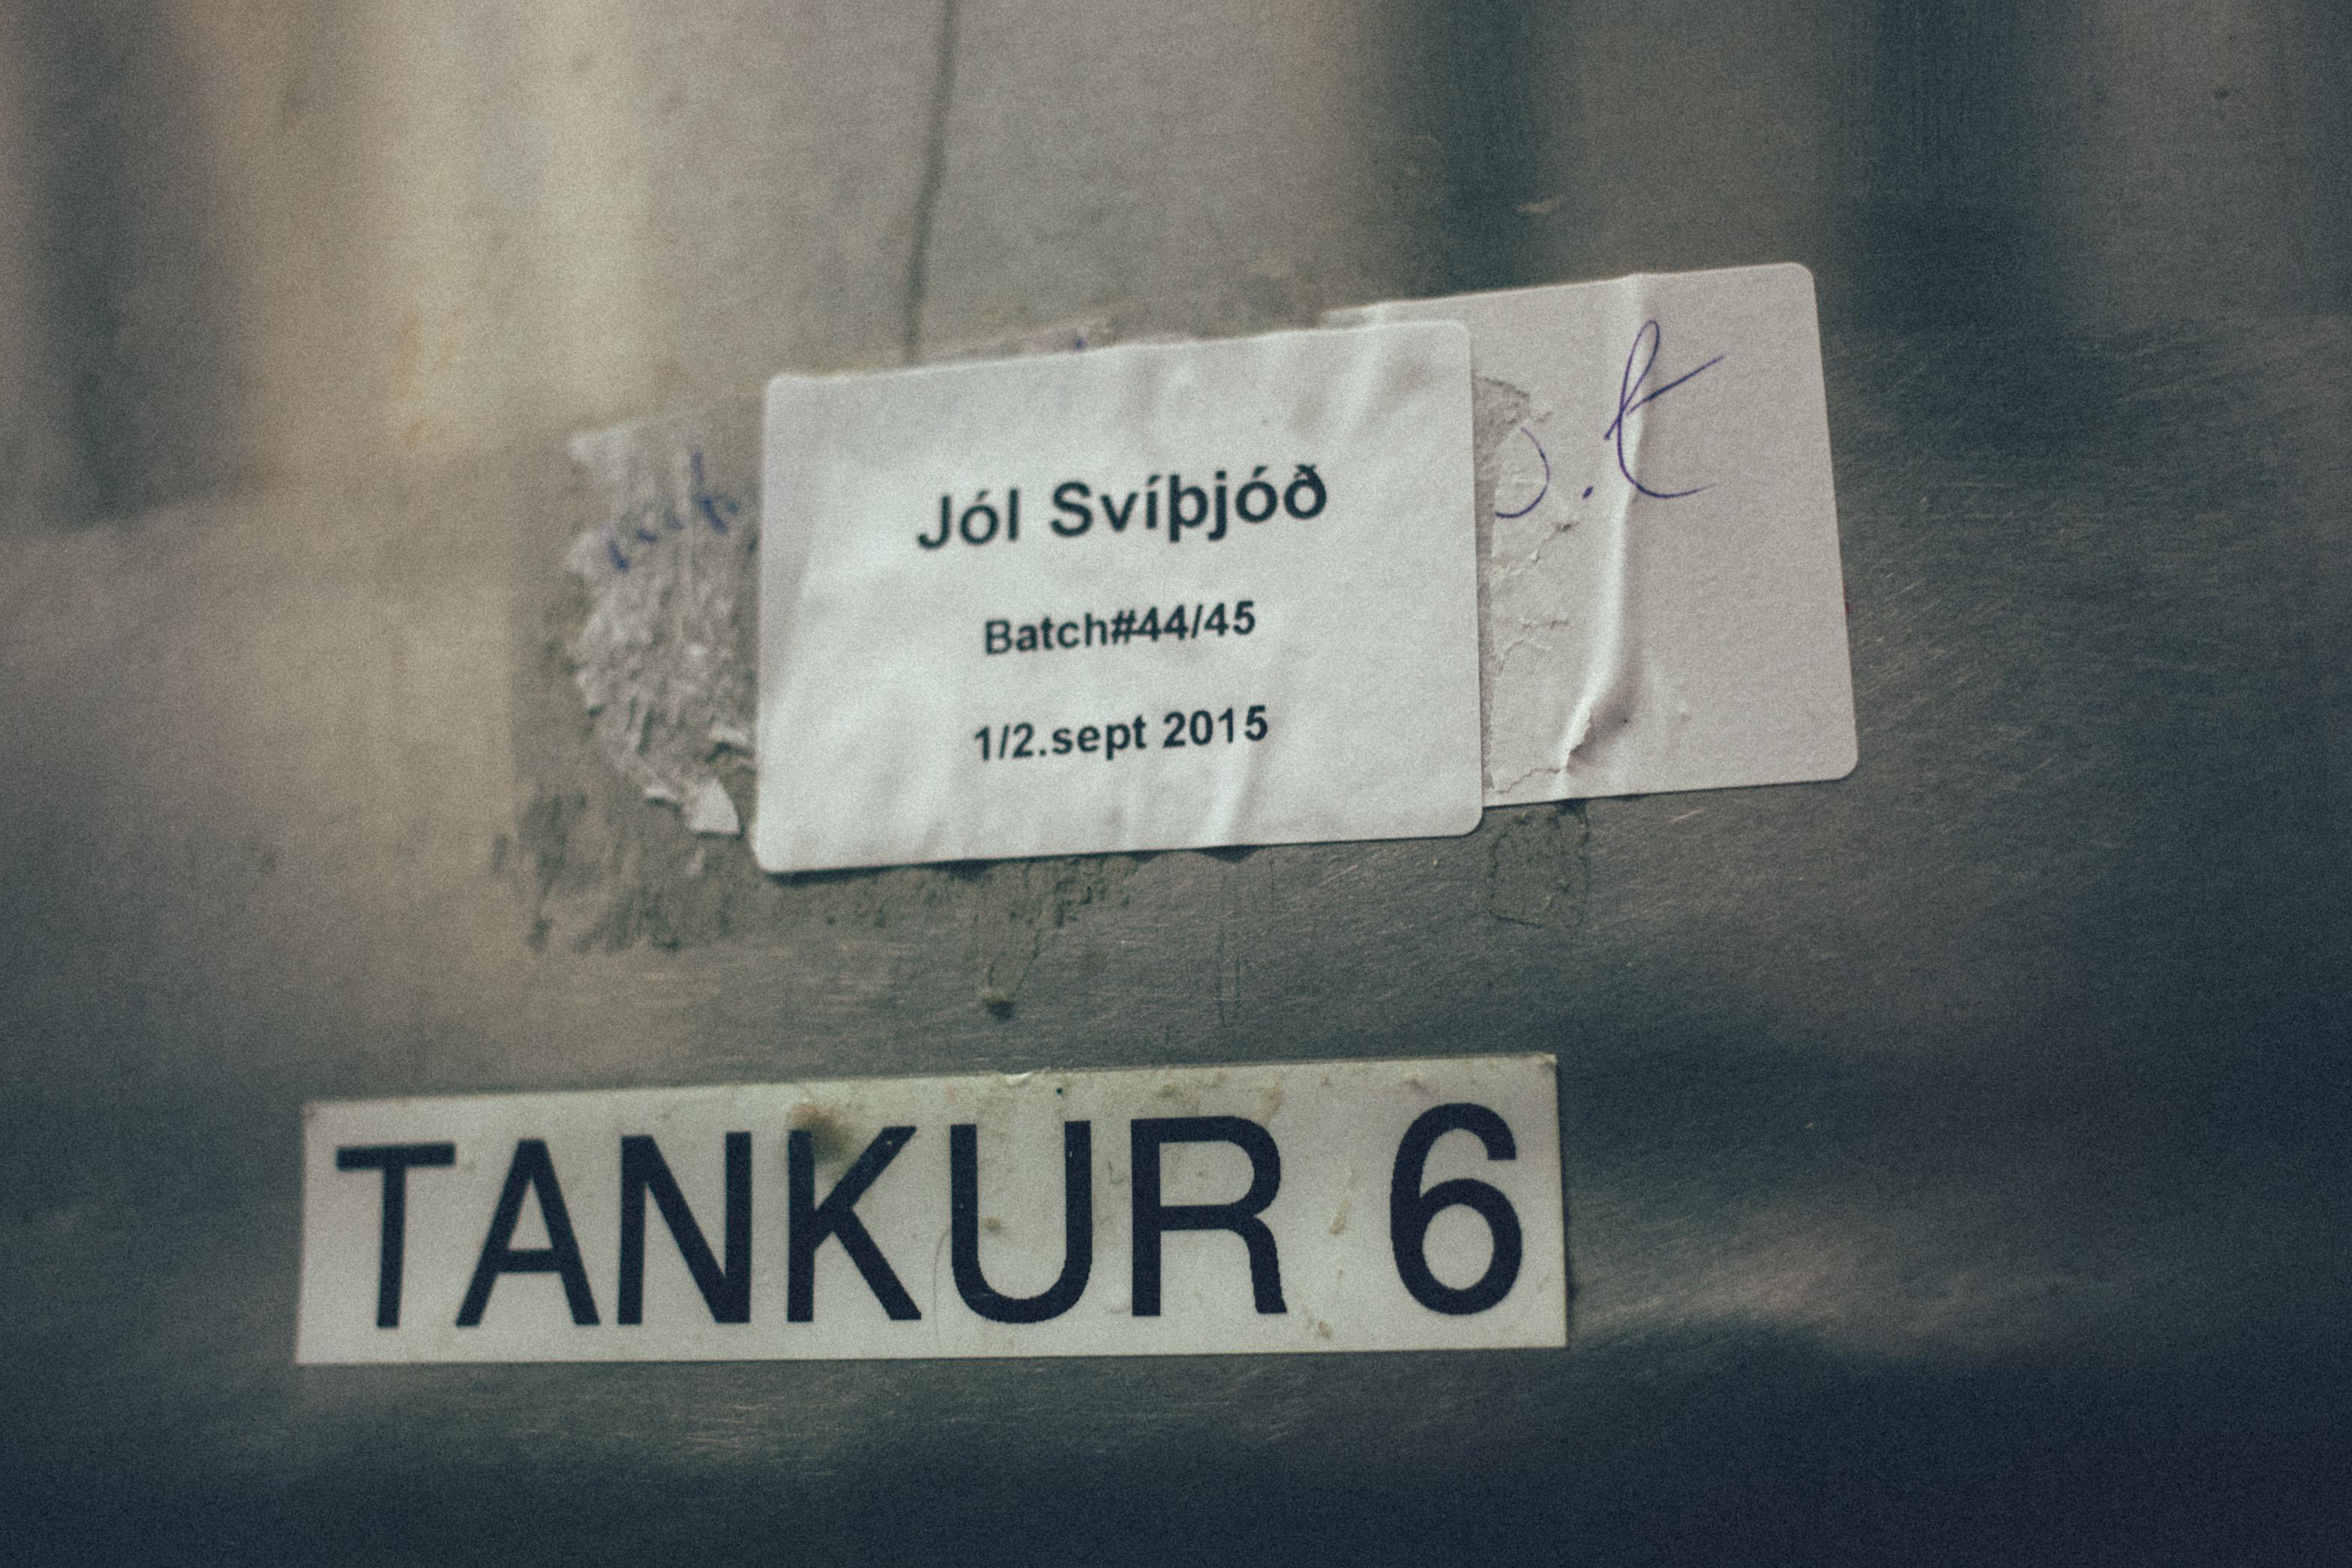 Olvisholt Tank 6 Fermentation tank